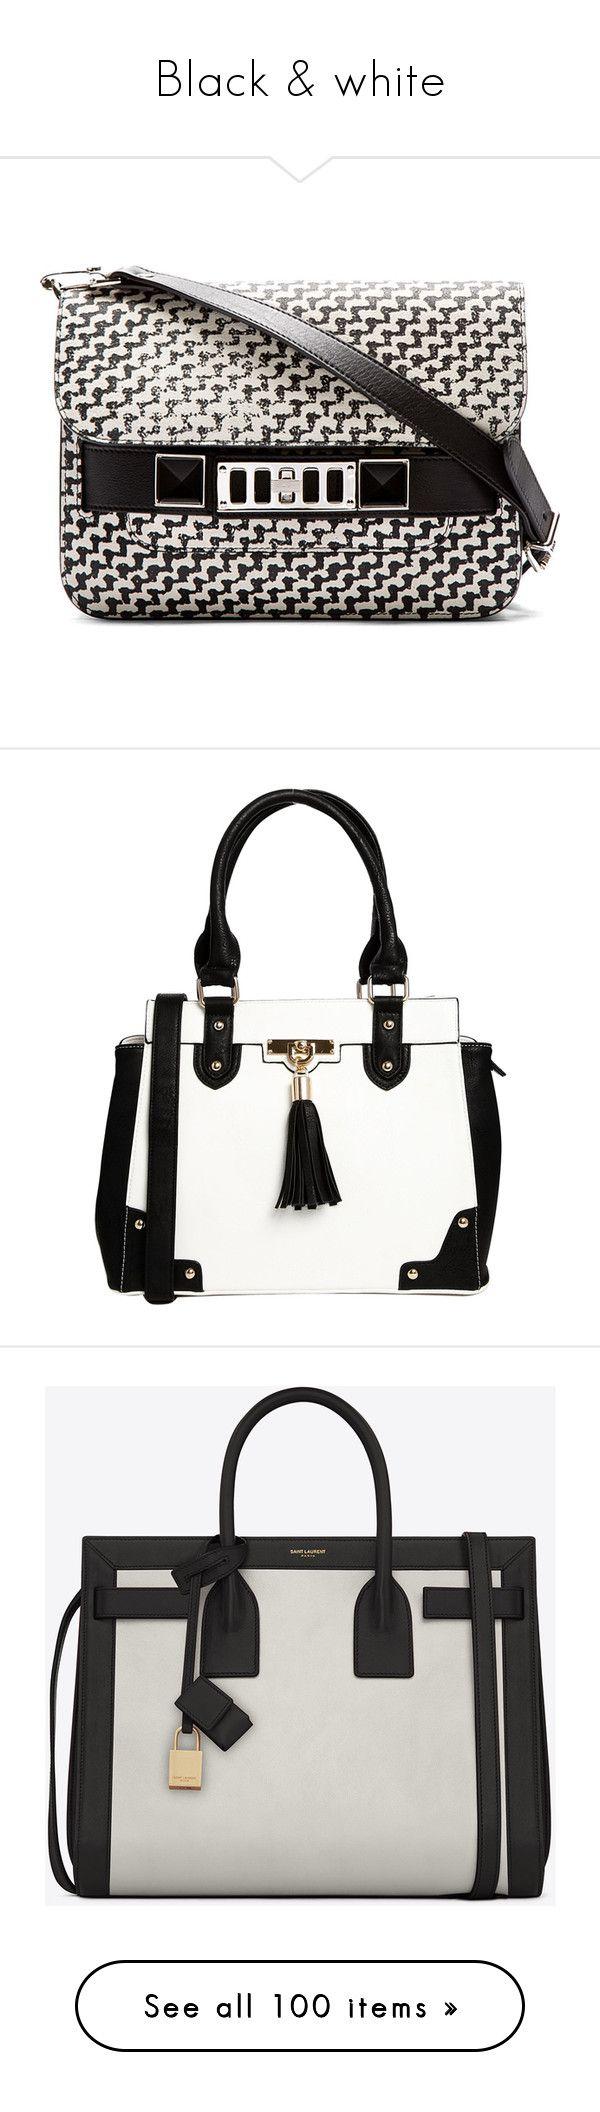 """Black & white"" by bliznec ❤ liked on Polyvore featuring bags, handbags, shoulder bags, purses, bolsas, accessories, borse, man shoulder bag, flap purse and mini shoulder bag"